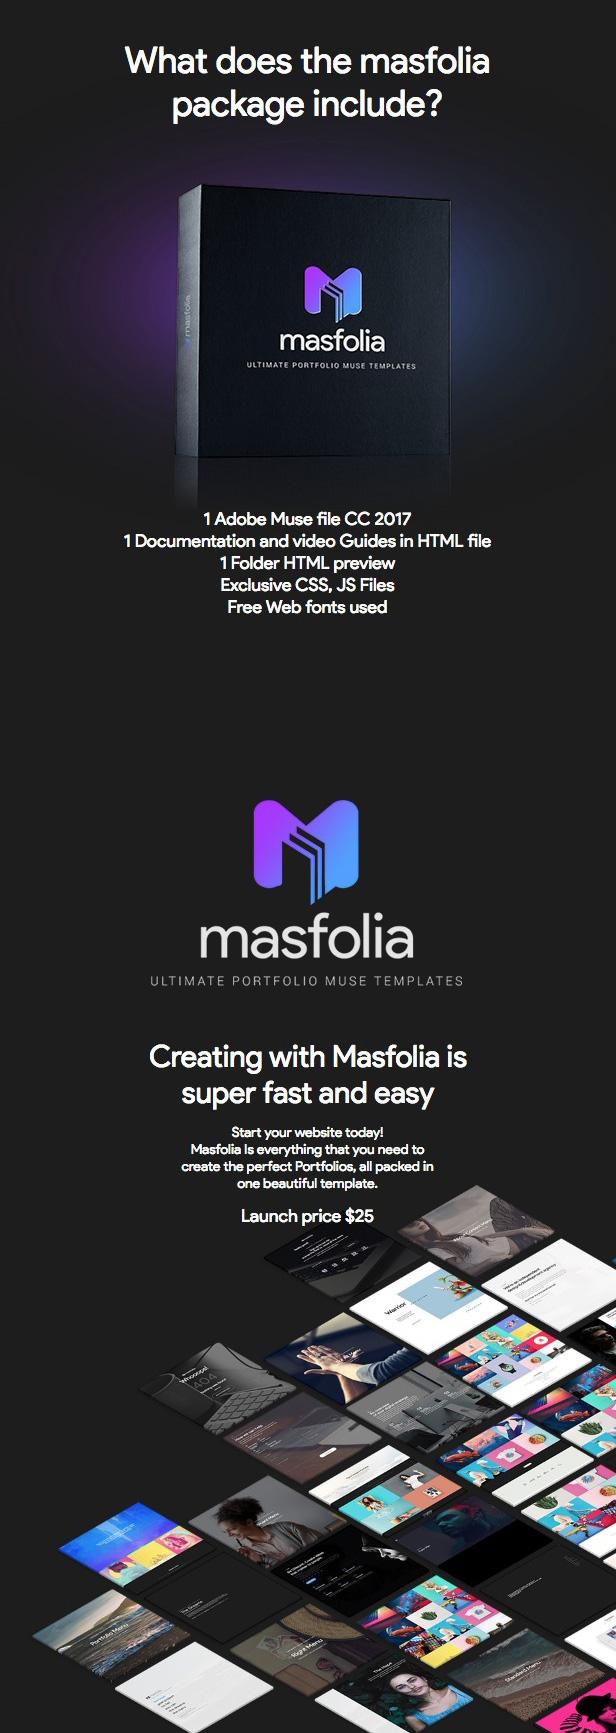 Masfolia - Ultimate Portfolio Muse Templates - 3